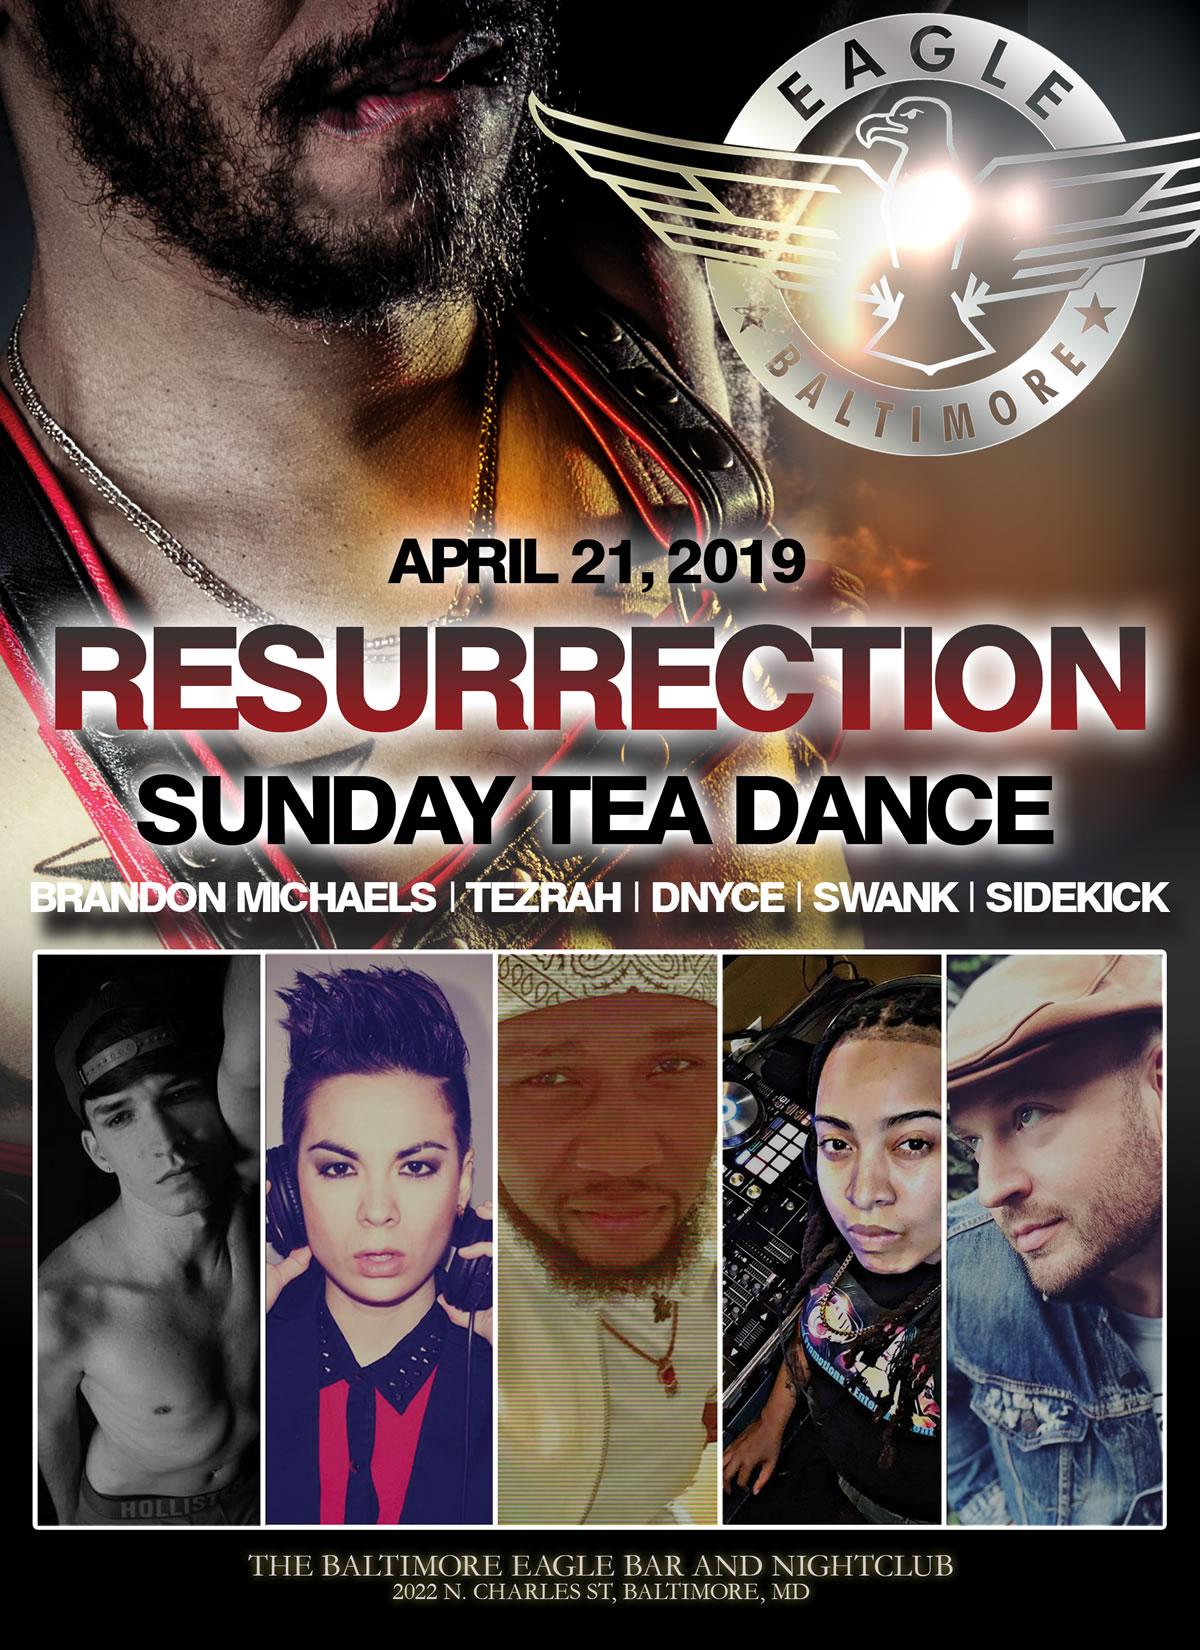 April 21 - Resurrection